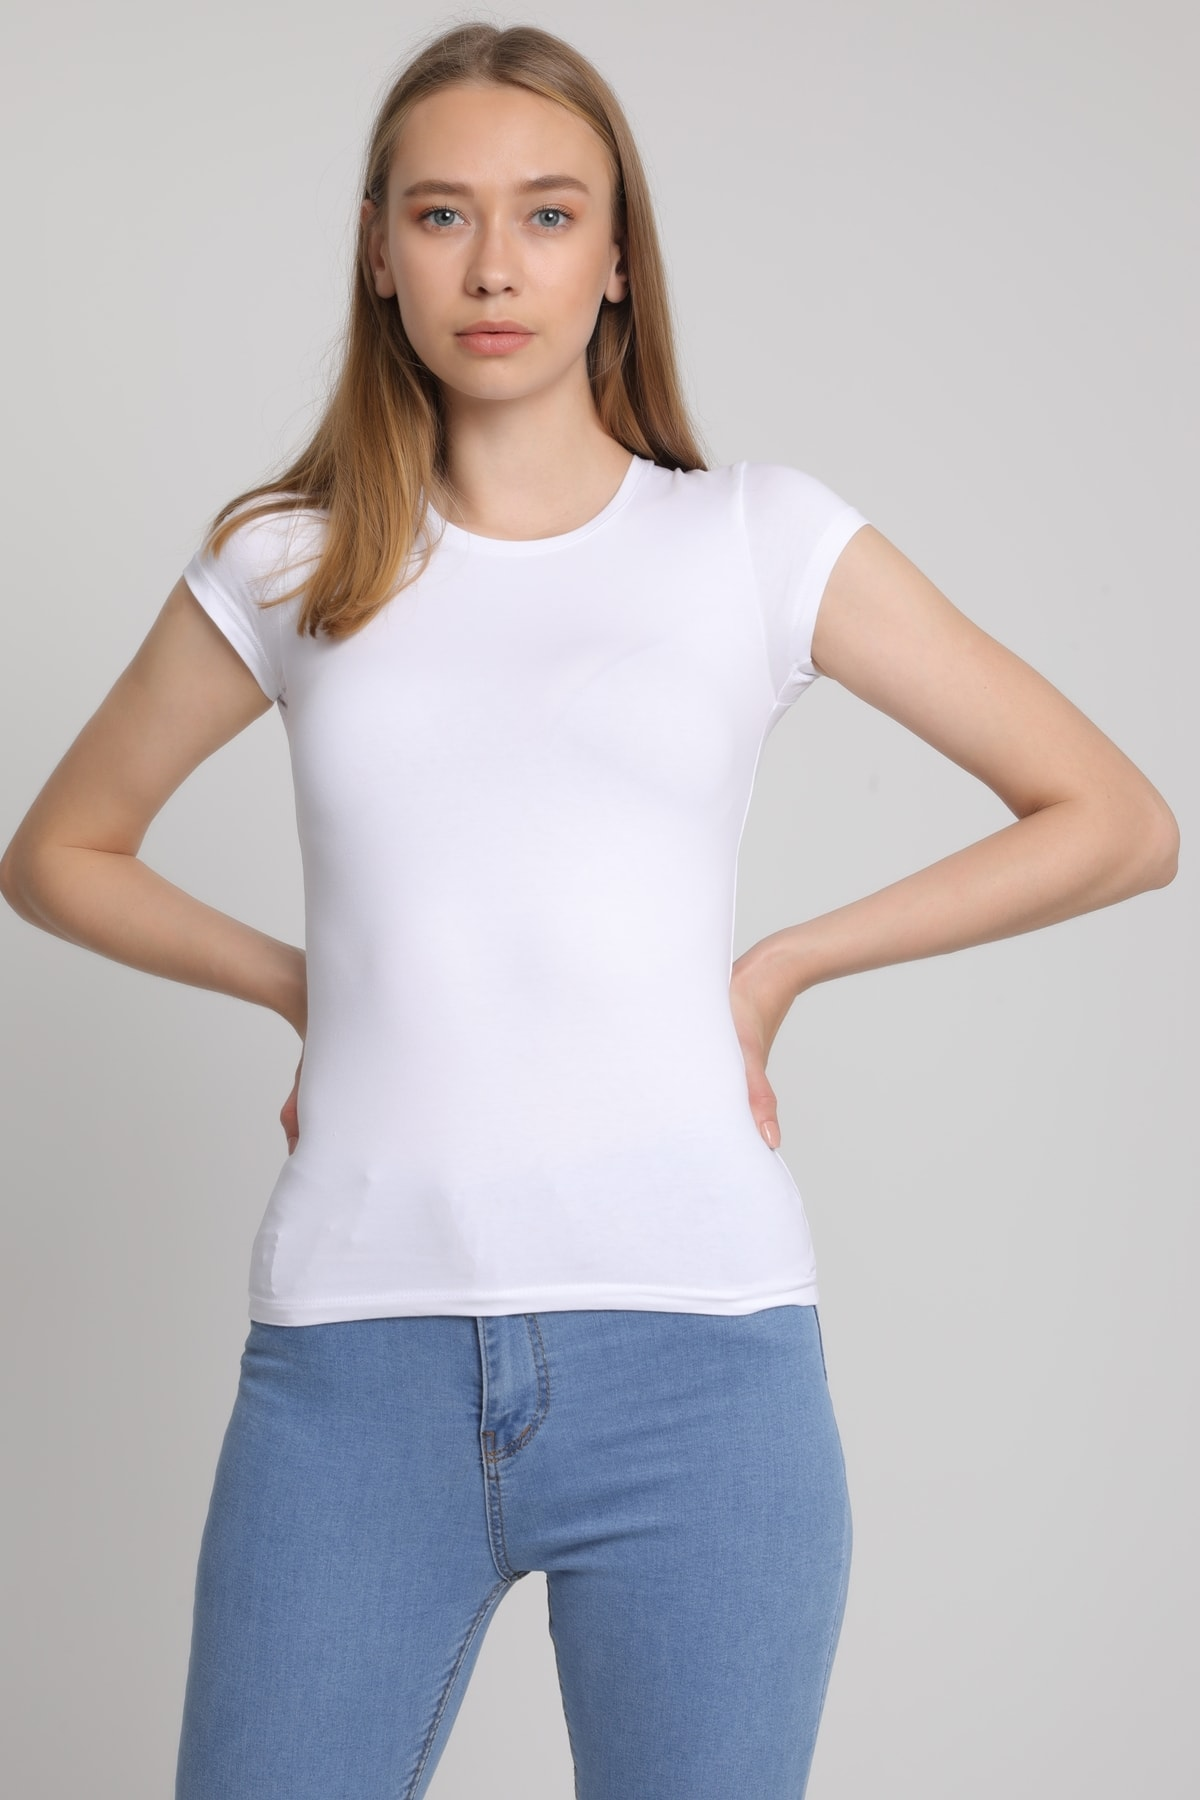 MD trend Kadın Beyaz Bisiklet Yaka T-Shirt Mdt3511 2